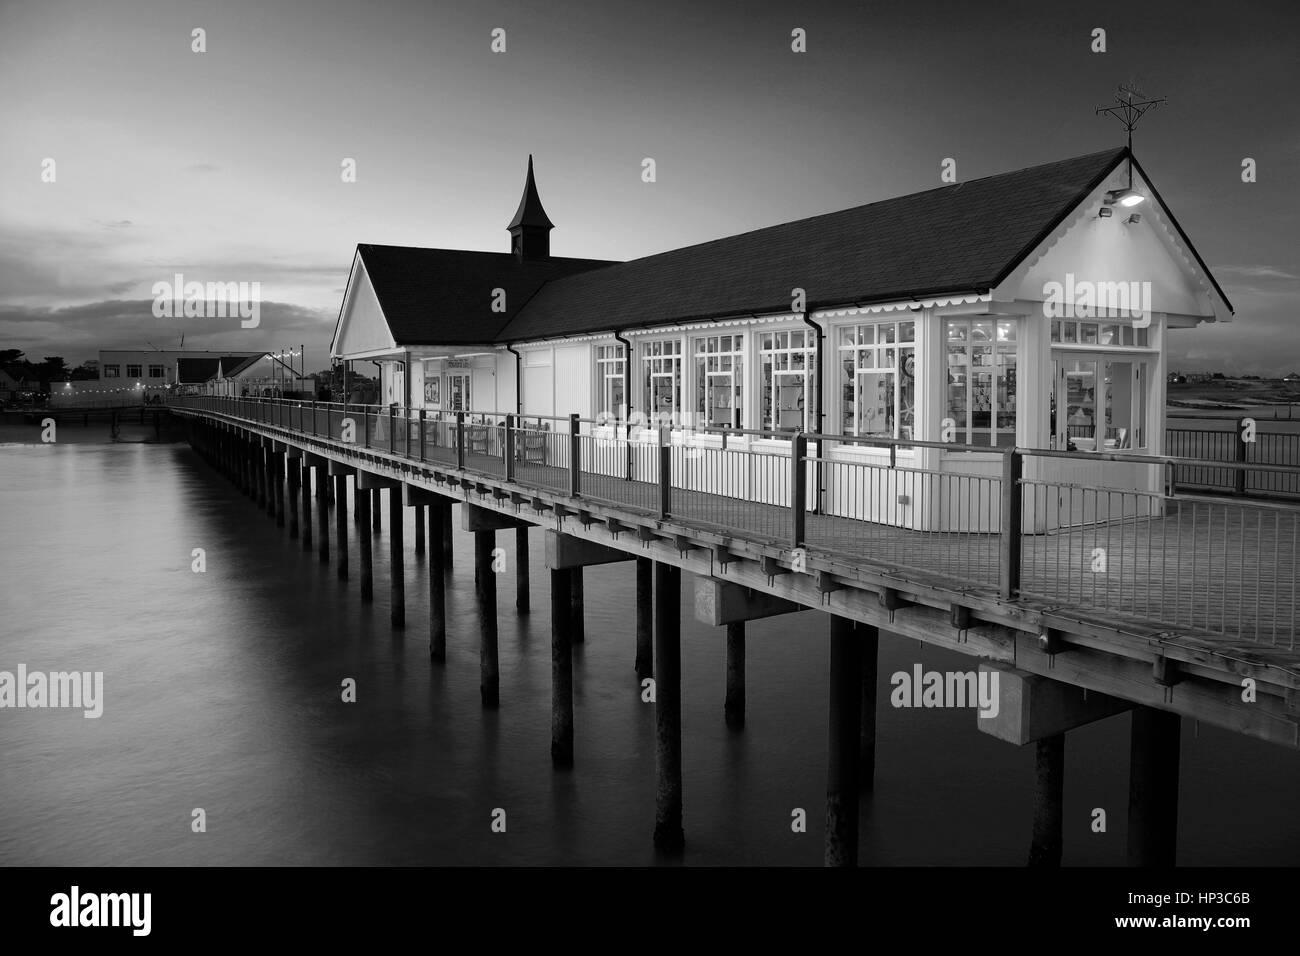 Dusk Southwold Pier Suffolk England UK - Stock Image